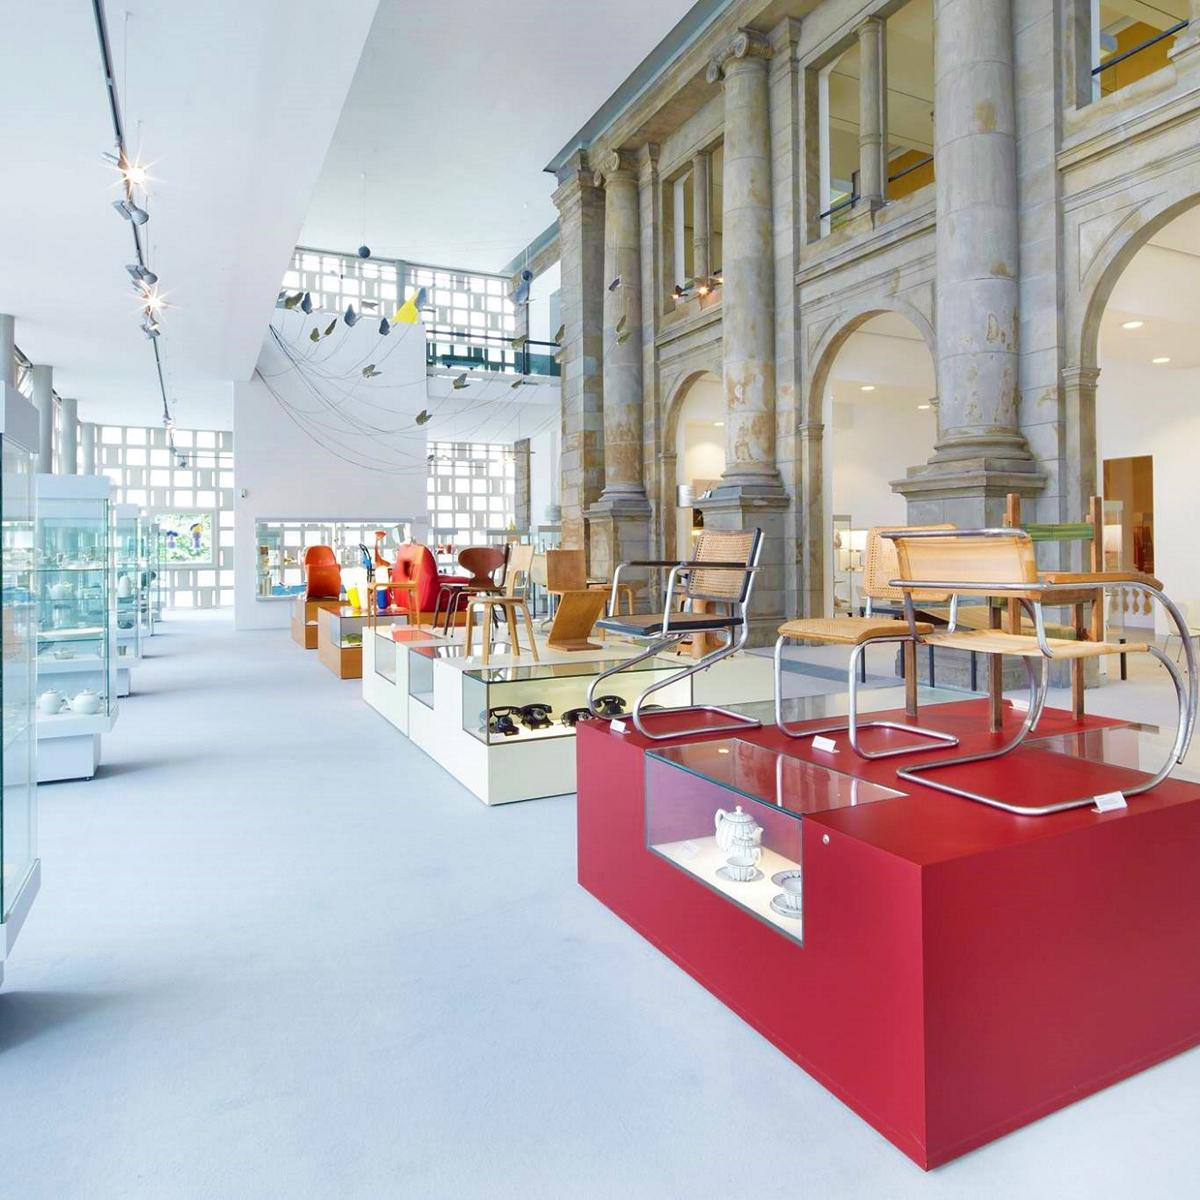 Style Hannover Museum August Kestner 3 - Museum August Kestner